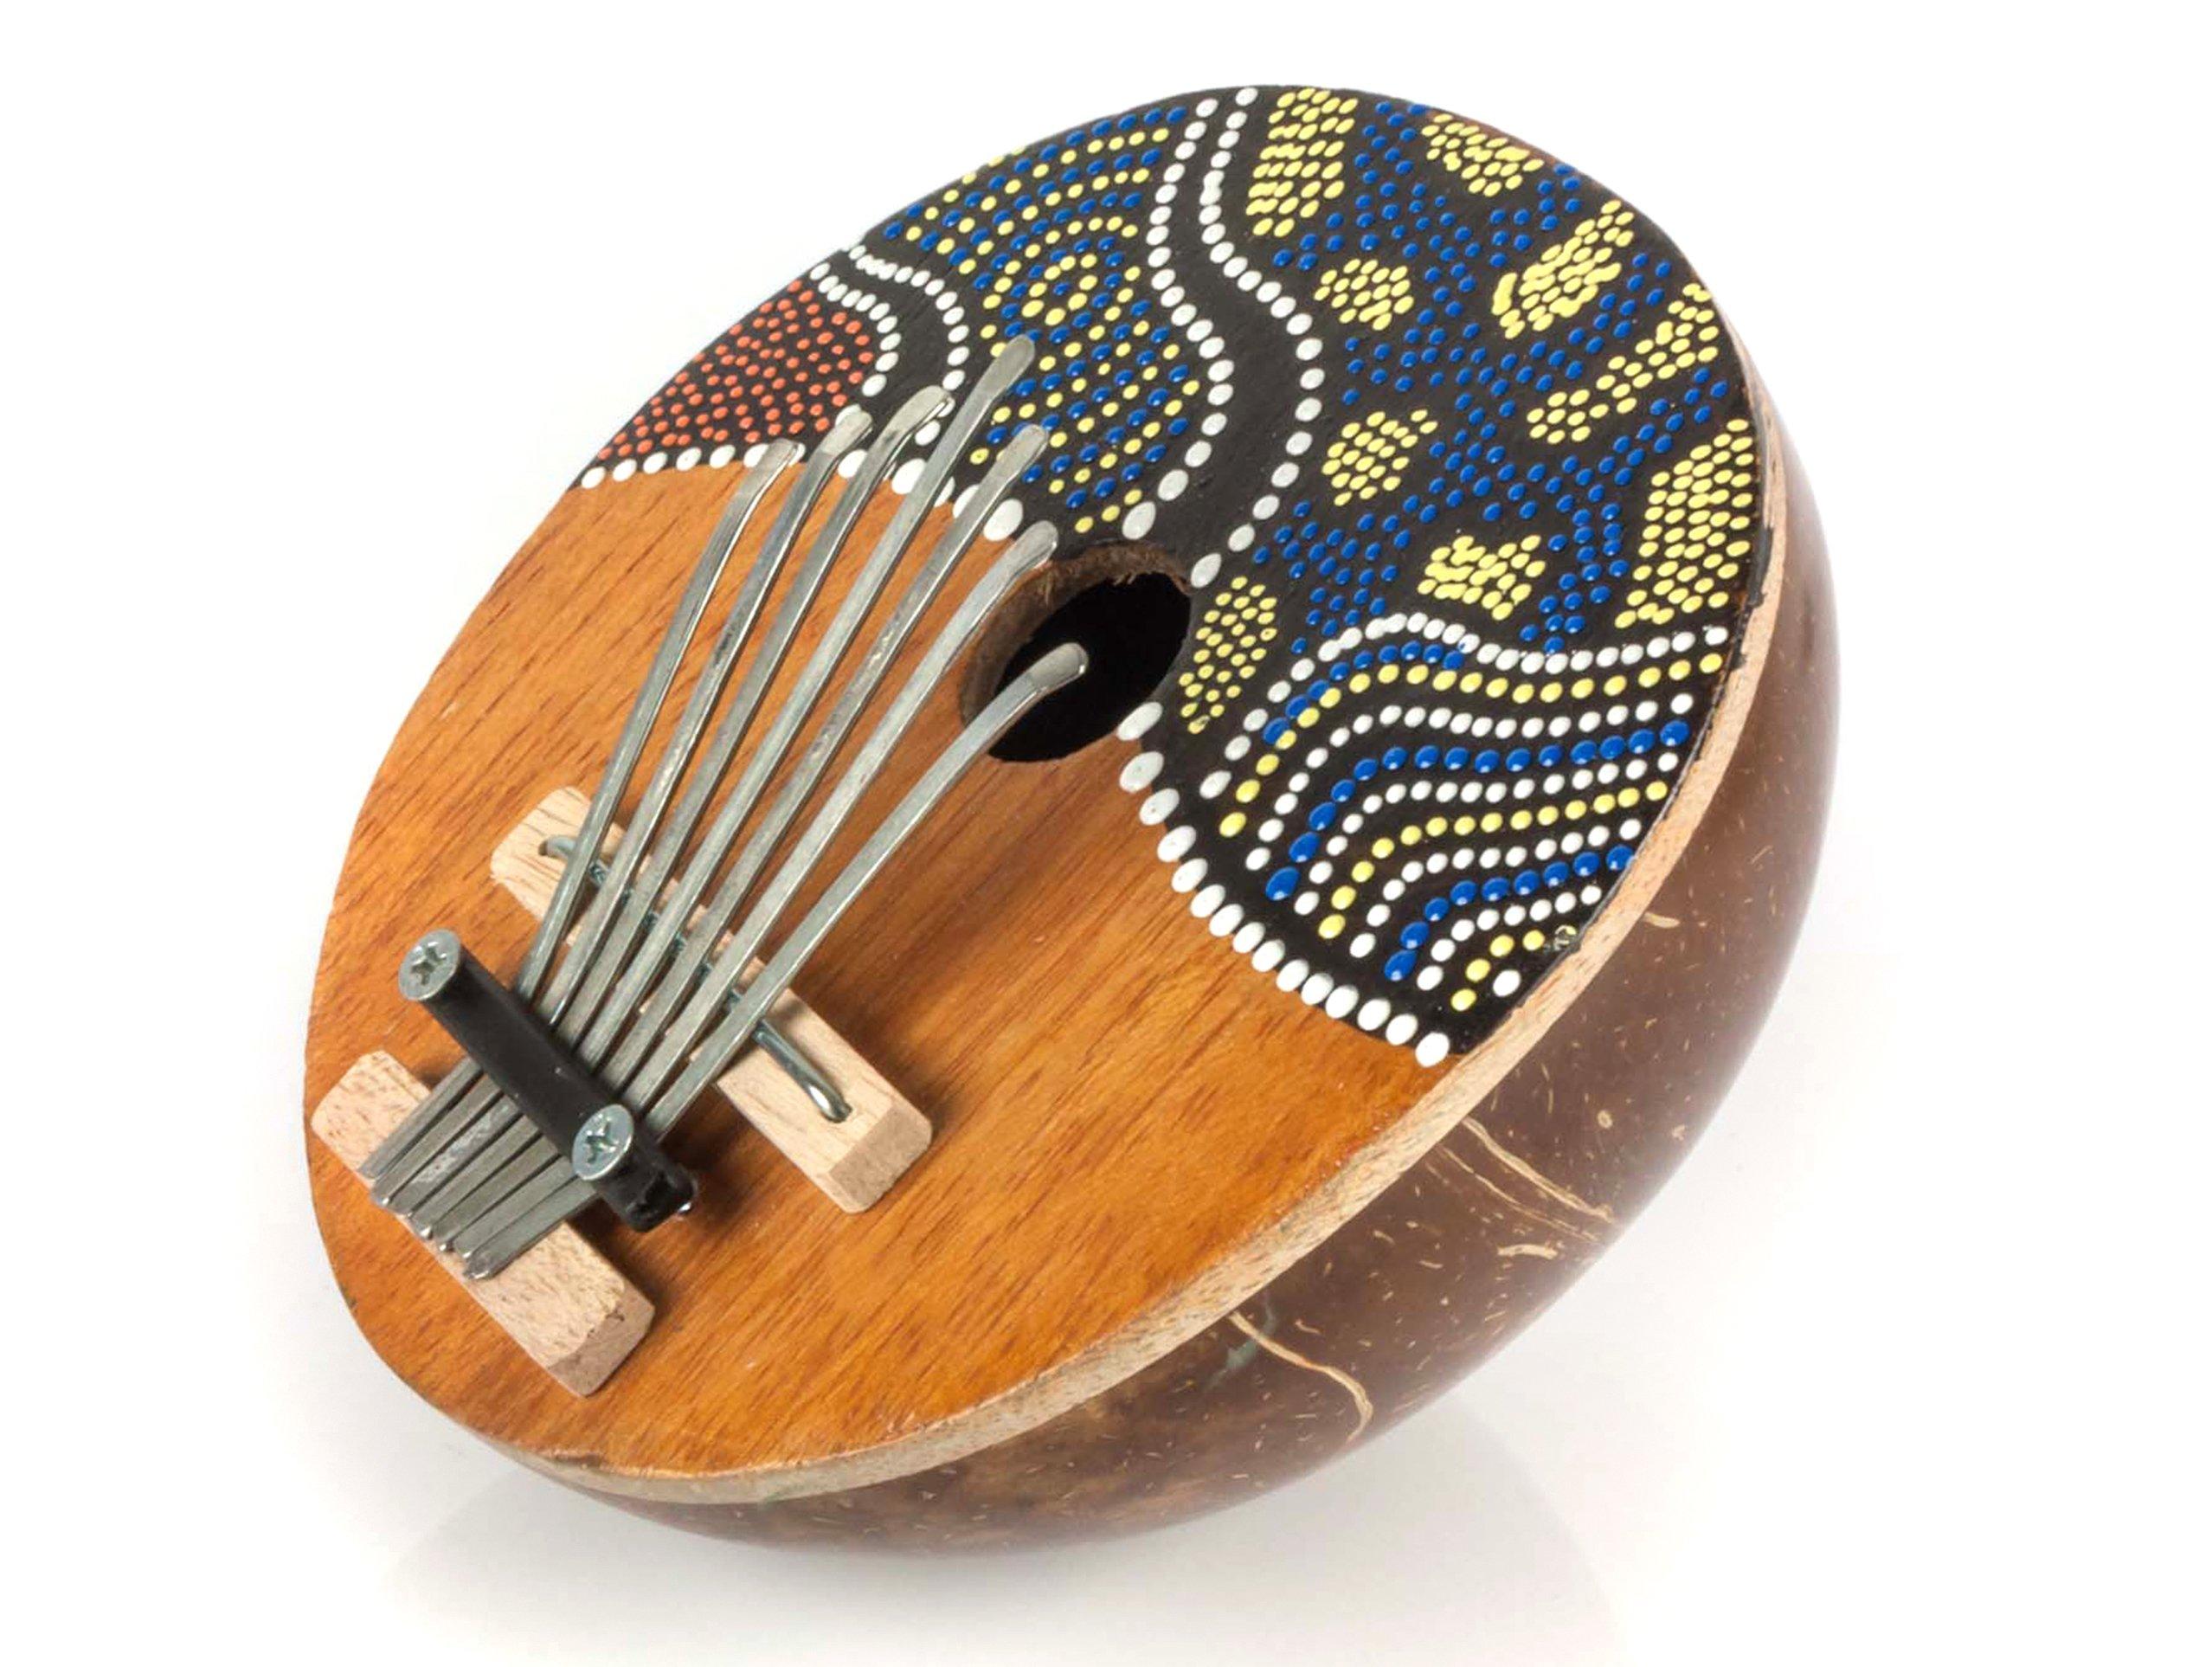 Karimba orientálny nástroj Kalimba z kokosu